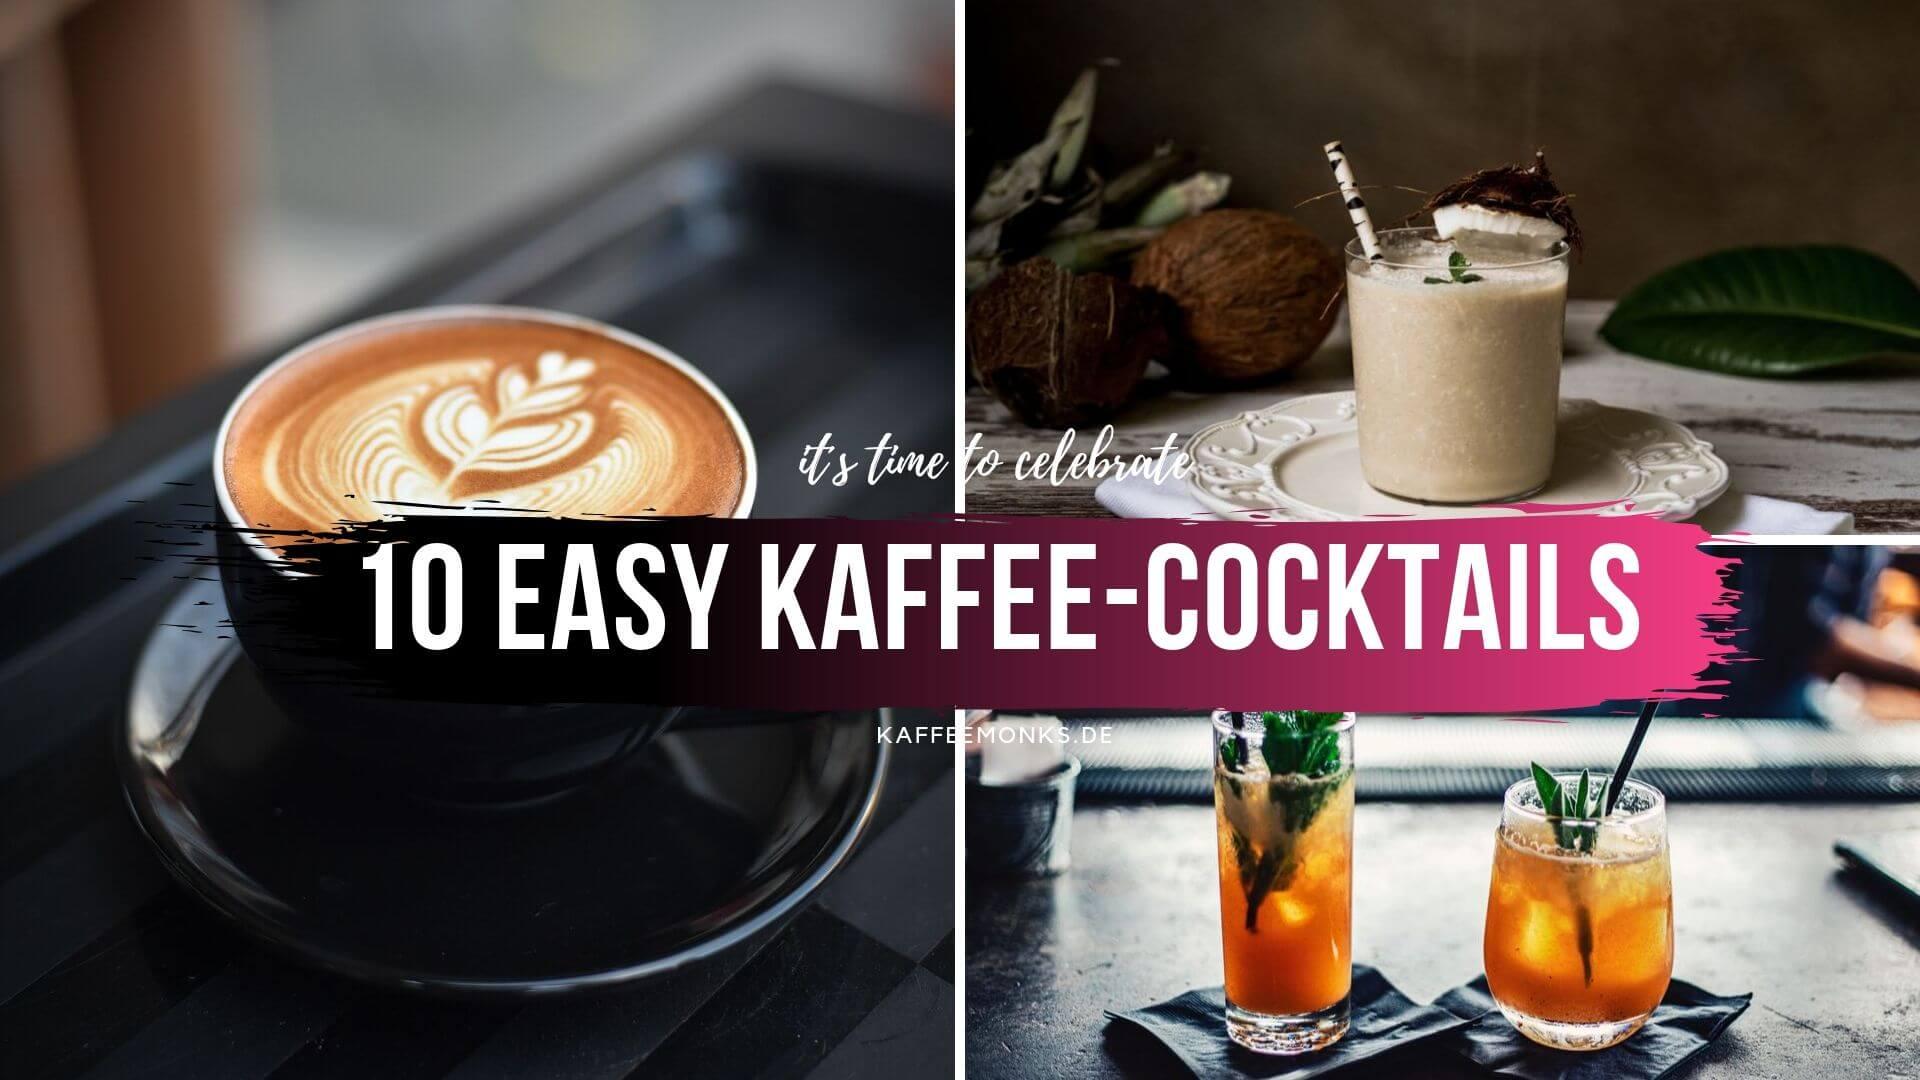 You are currently viewing 10 LECKERE KAFFEE-COCKTAILS ZUM NACHMACHEN